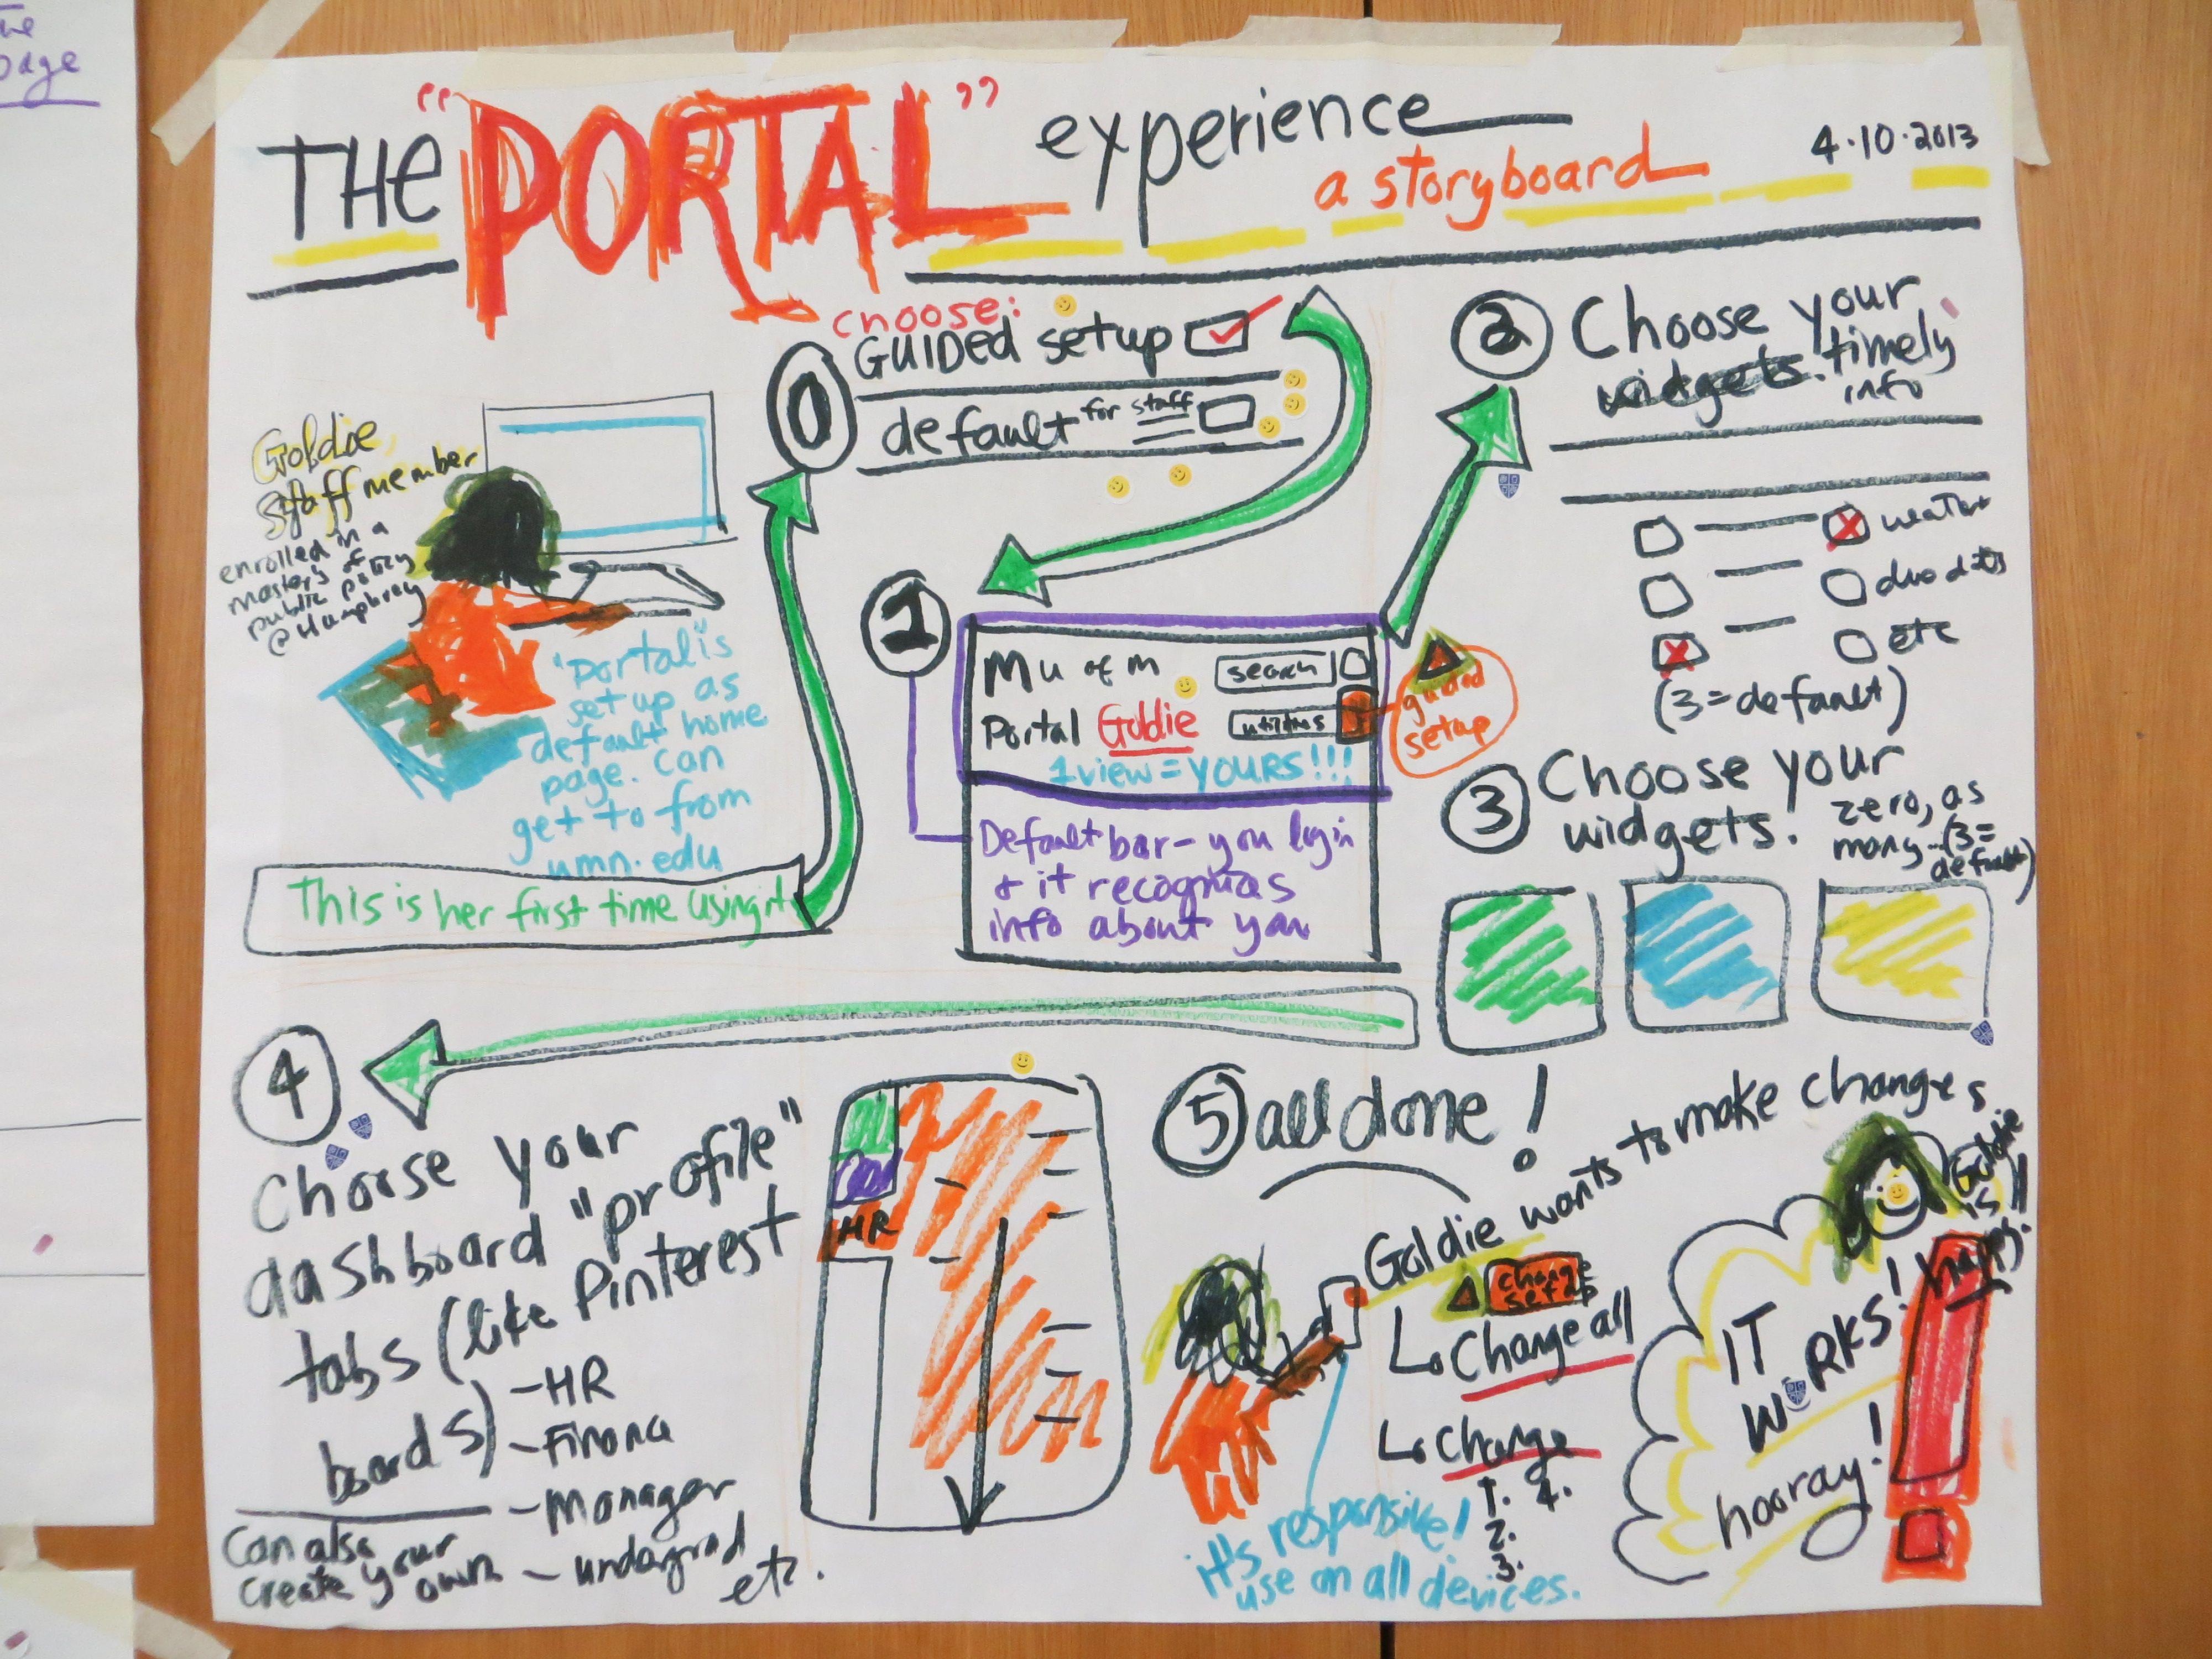 Pin By Umn Portal On Design Thinking Workshops Prototypes Design Thinking Workshop Design Thinking U Turn